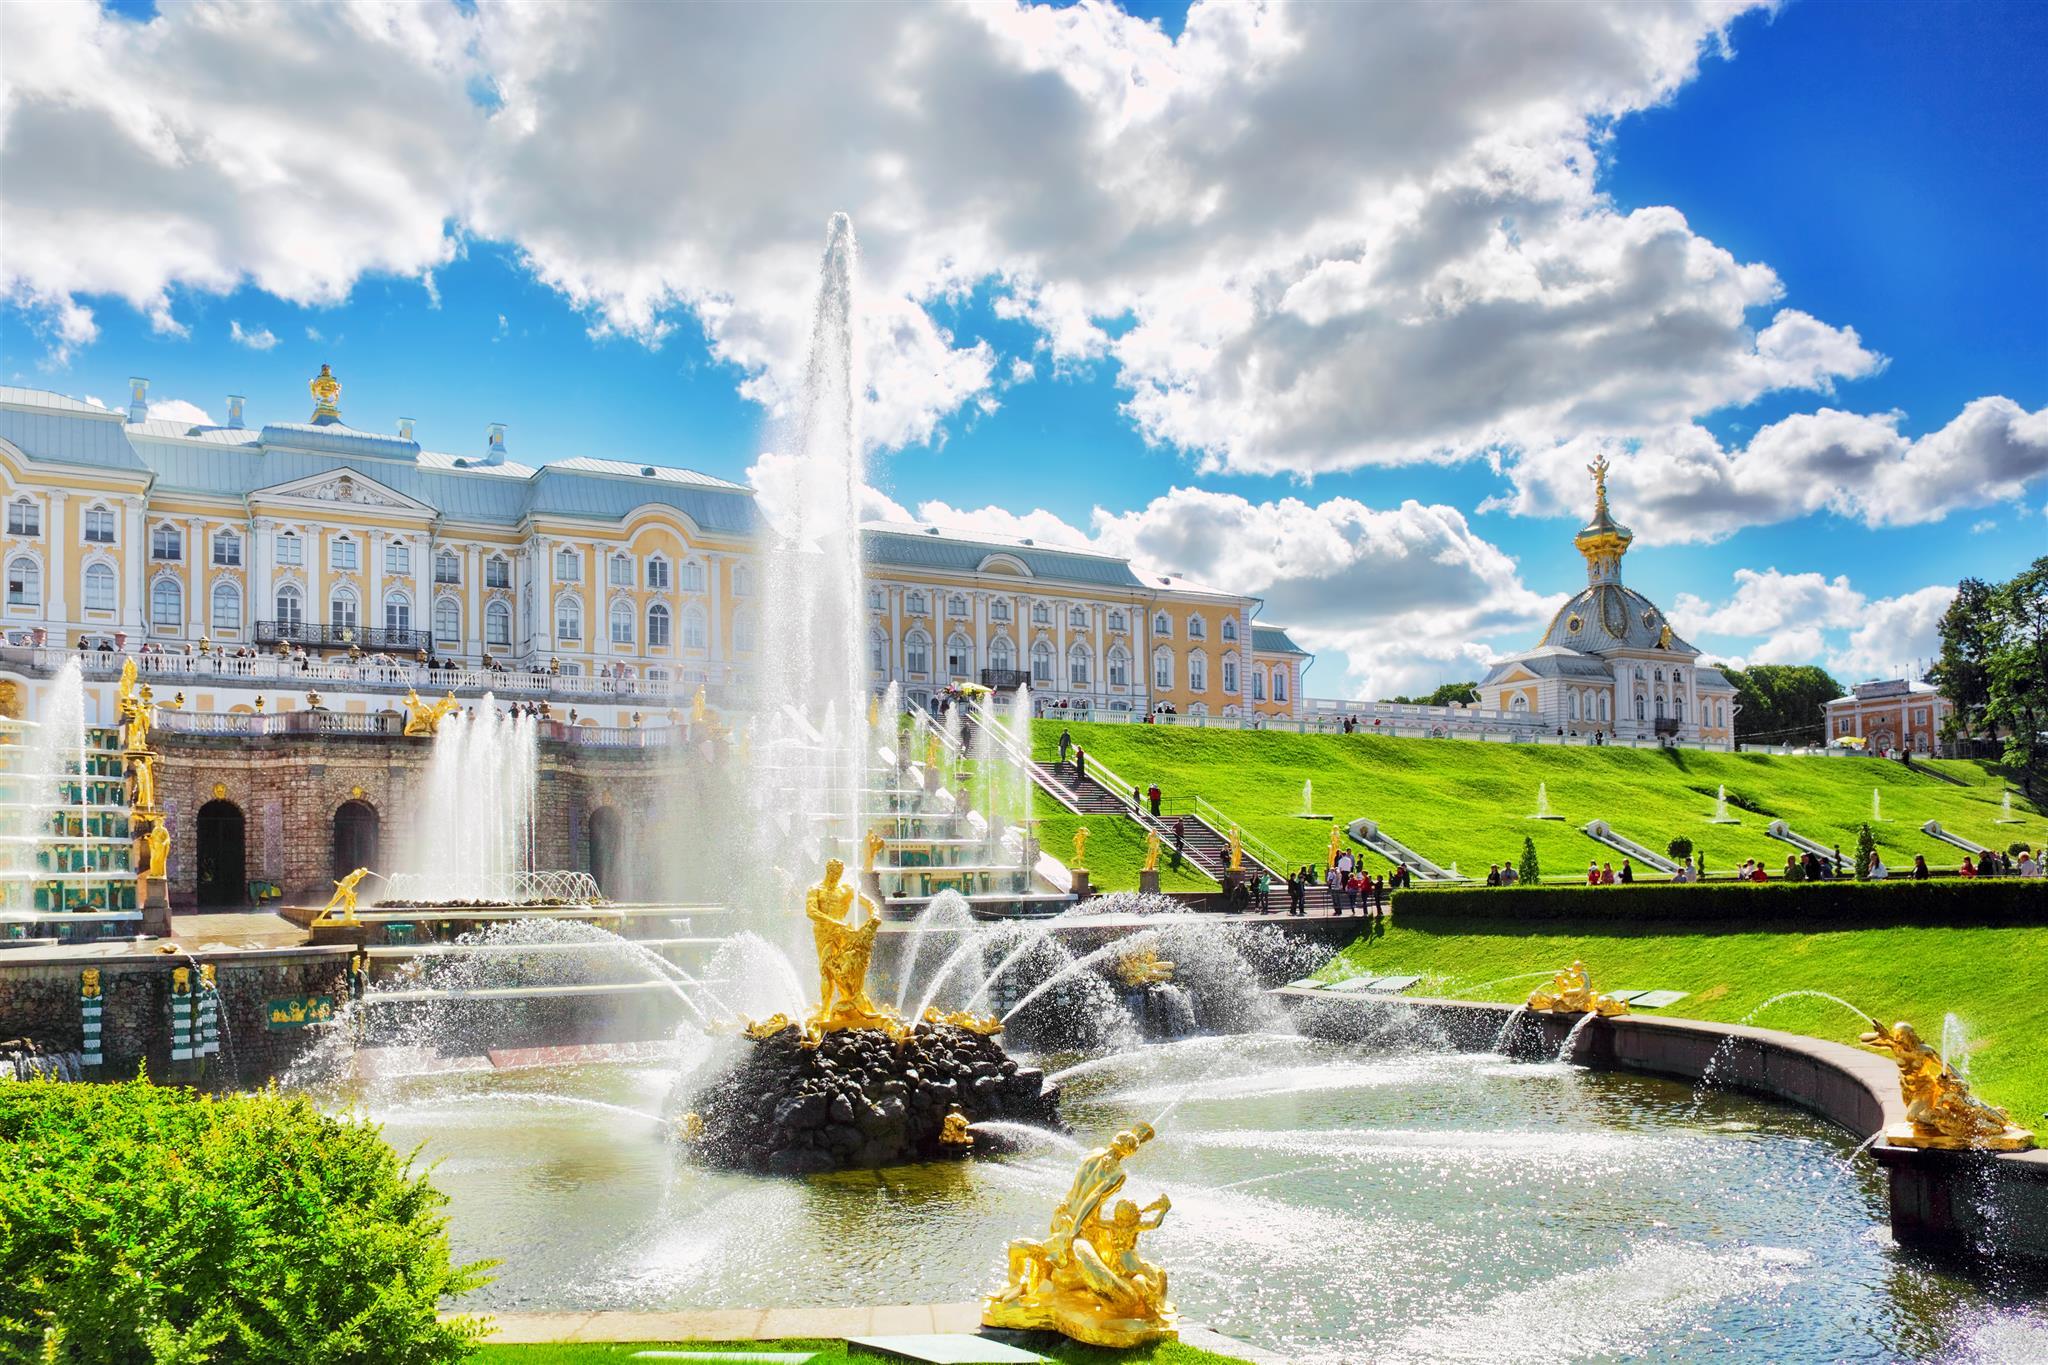 Dreamstime © - Saint-Pétersbourg - Peterhof - Jardins et fontaines (3)